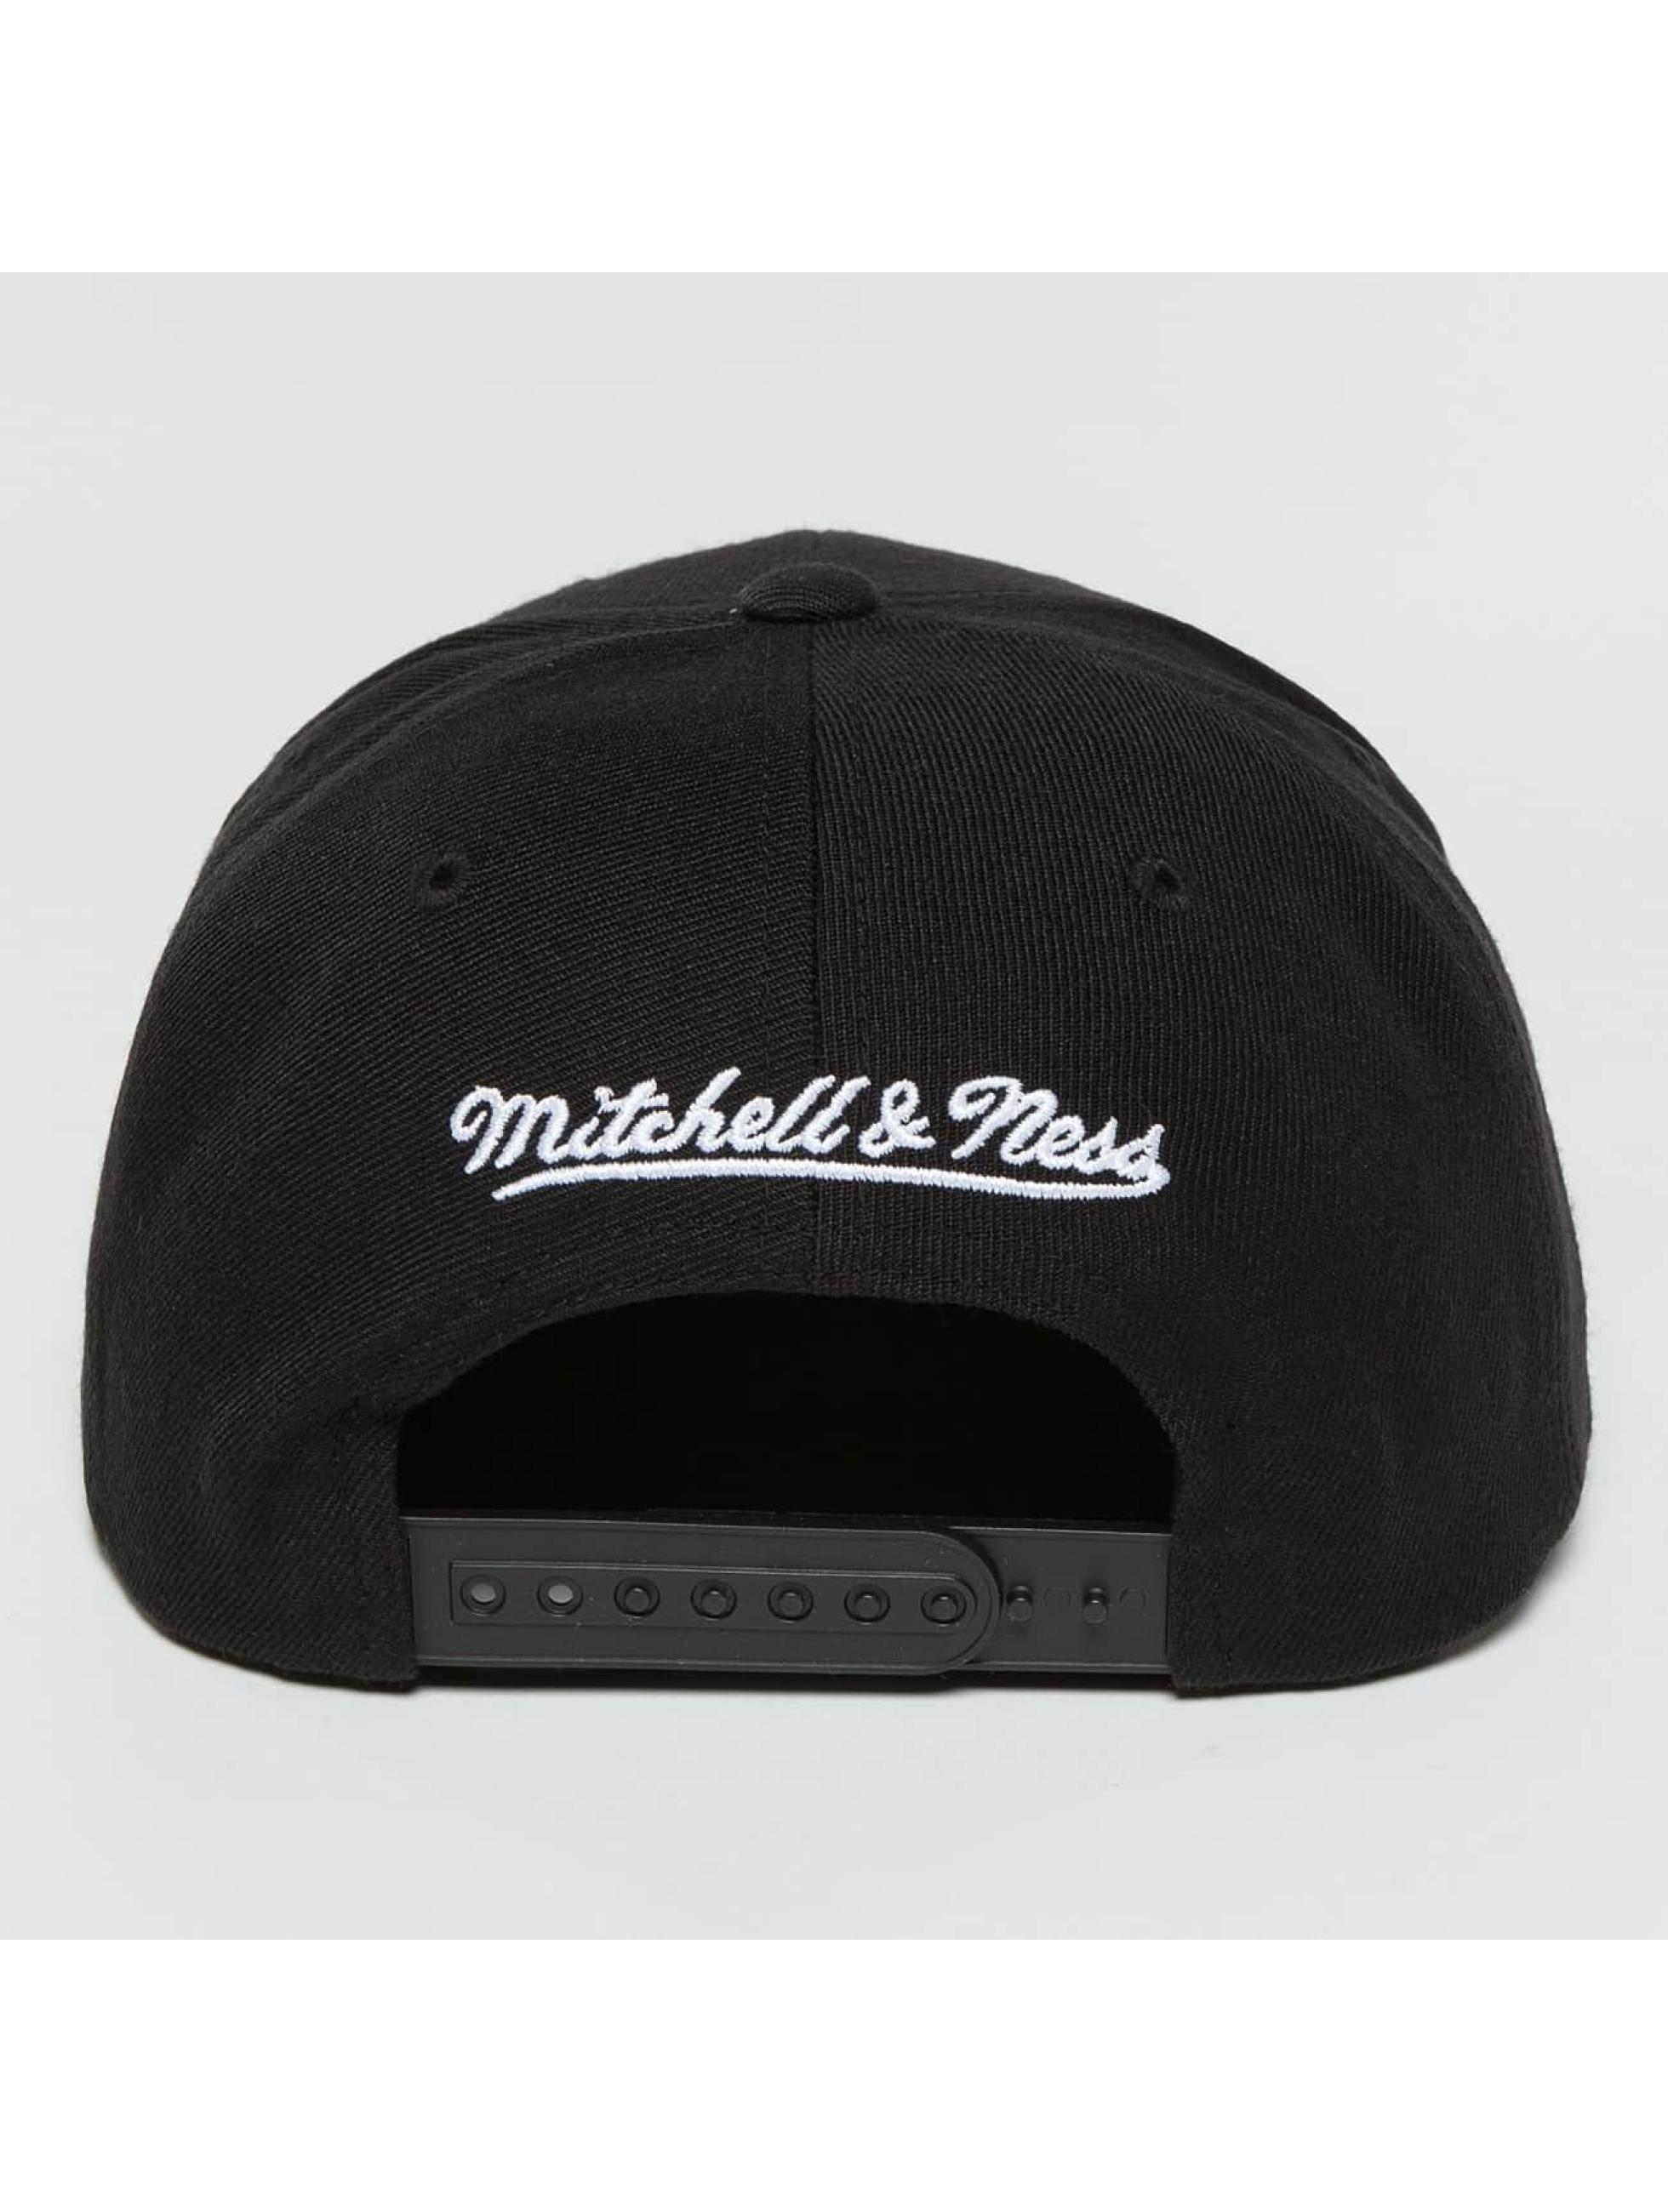 Mitchell & Ness Кепка с застёжкой Full Dollar Golden State Warriors черный